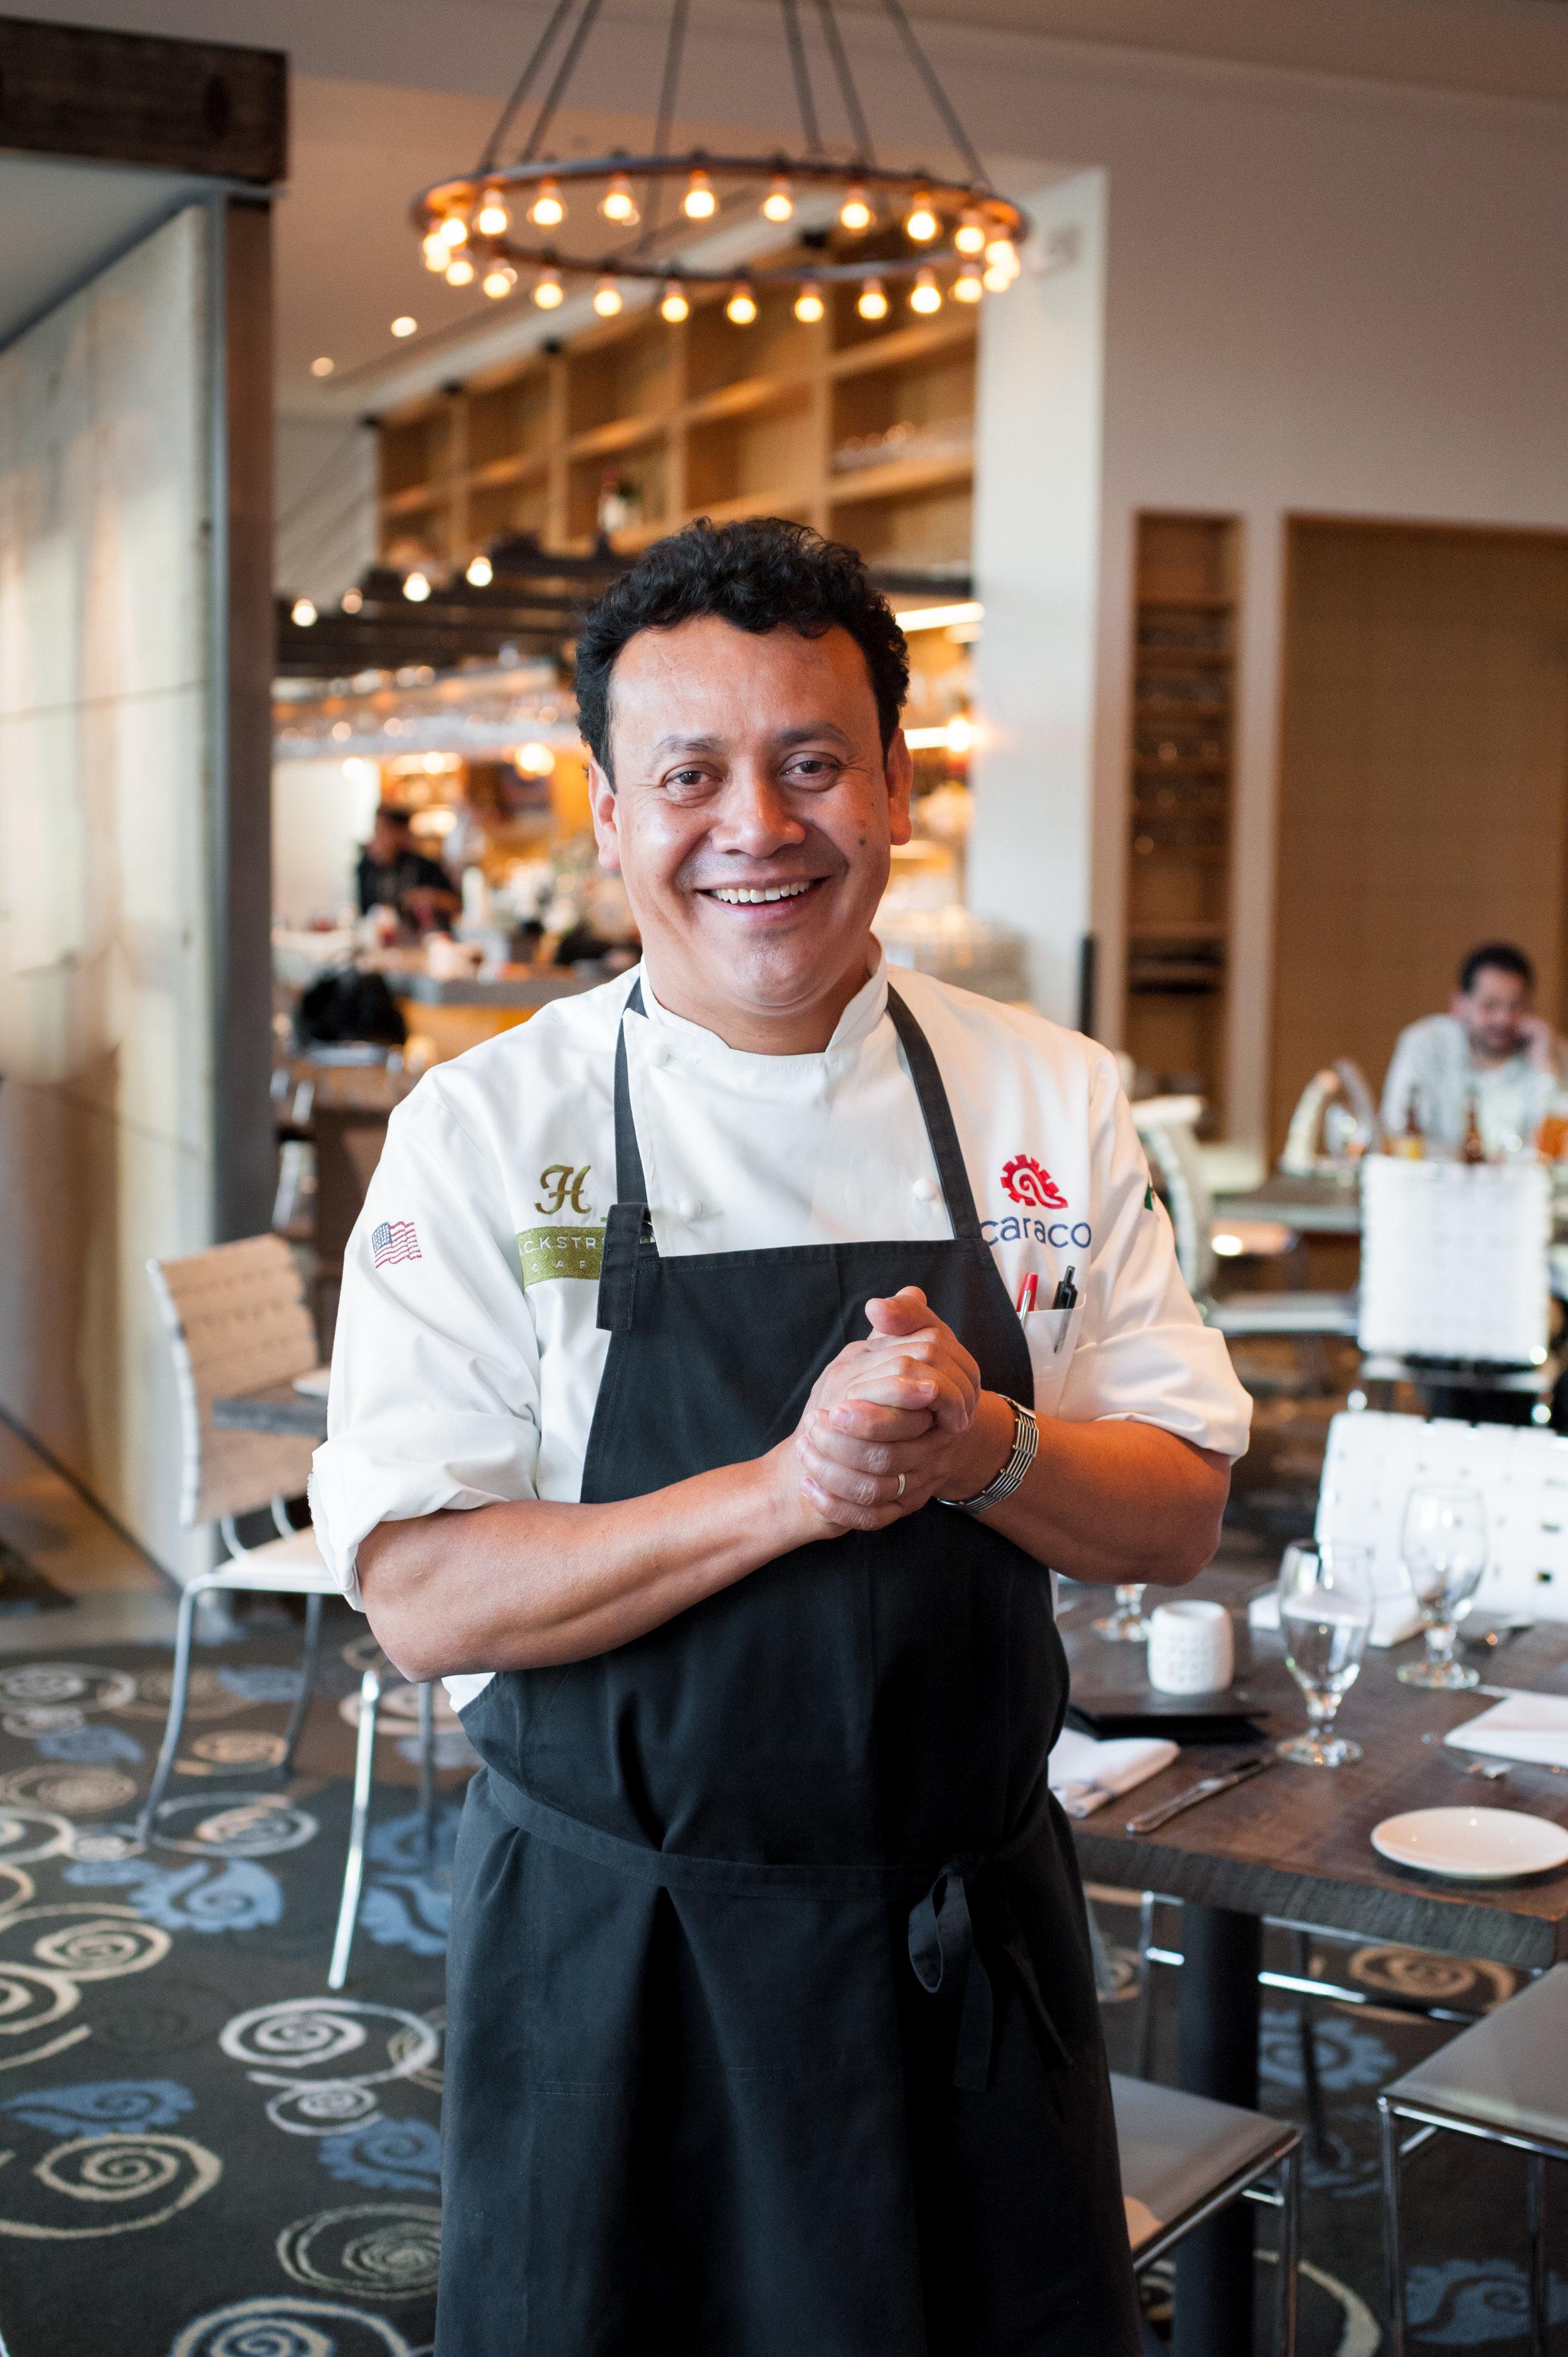 Chef/Owner,H Town Restaurant Group  (Hugo's  Caracol  Backstreet Café  Xochi)   Houston, TX  James Beard Award Best Chef Southwest winner, 2017;finalist, 2012, 2013, 2014, 2015,2016  htownrestaurantgroup.com